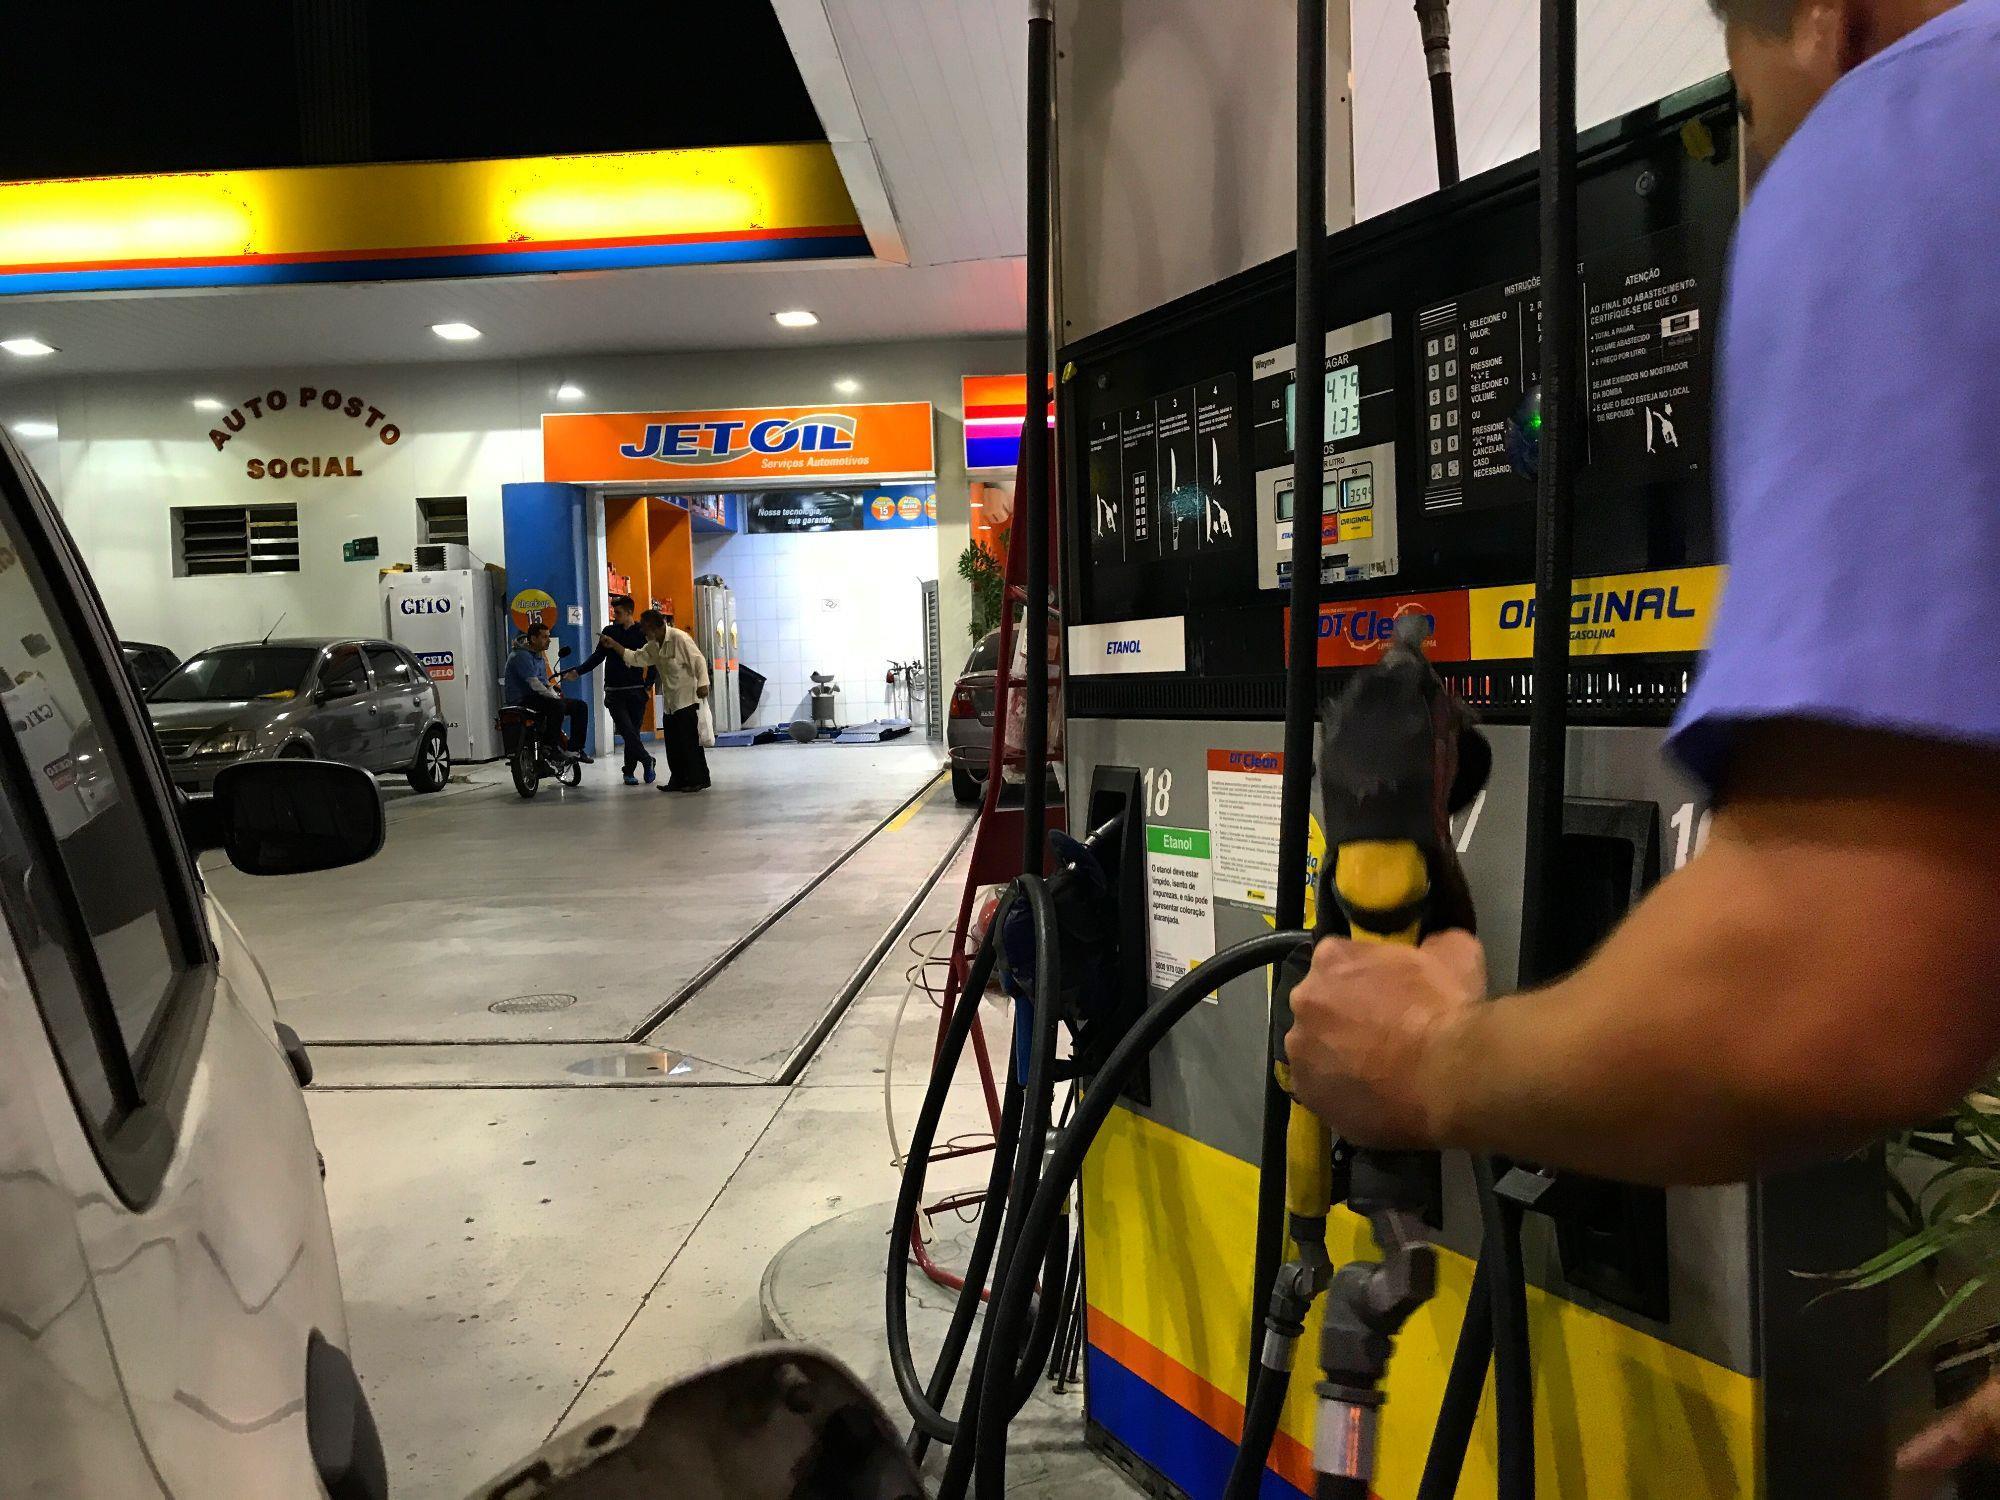 combustivel, postodecombustivel, frentistas, proposta, MP, deputado, sindicato, Roberto Parizotti/Fotos Públicas